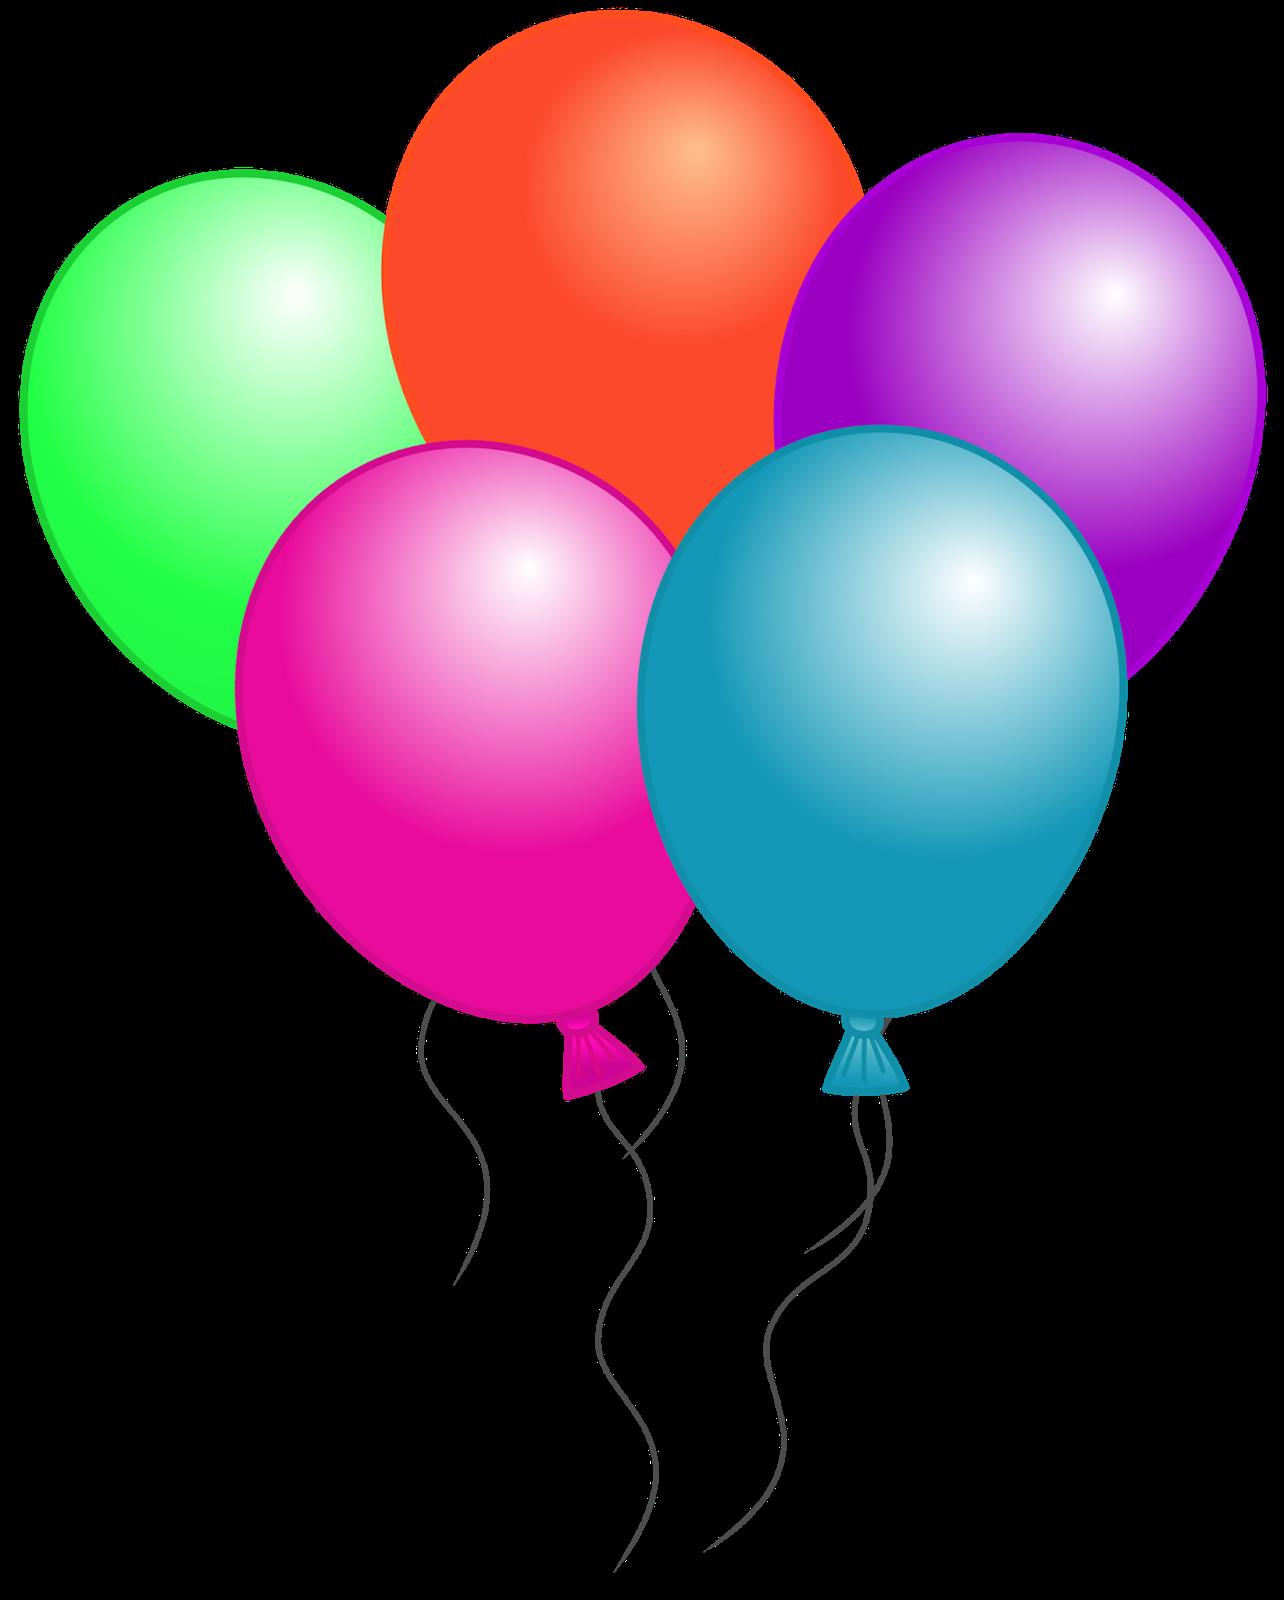 Clipart Panda Green Balloon